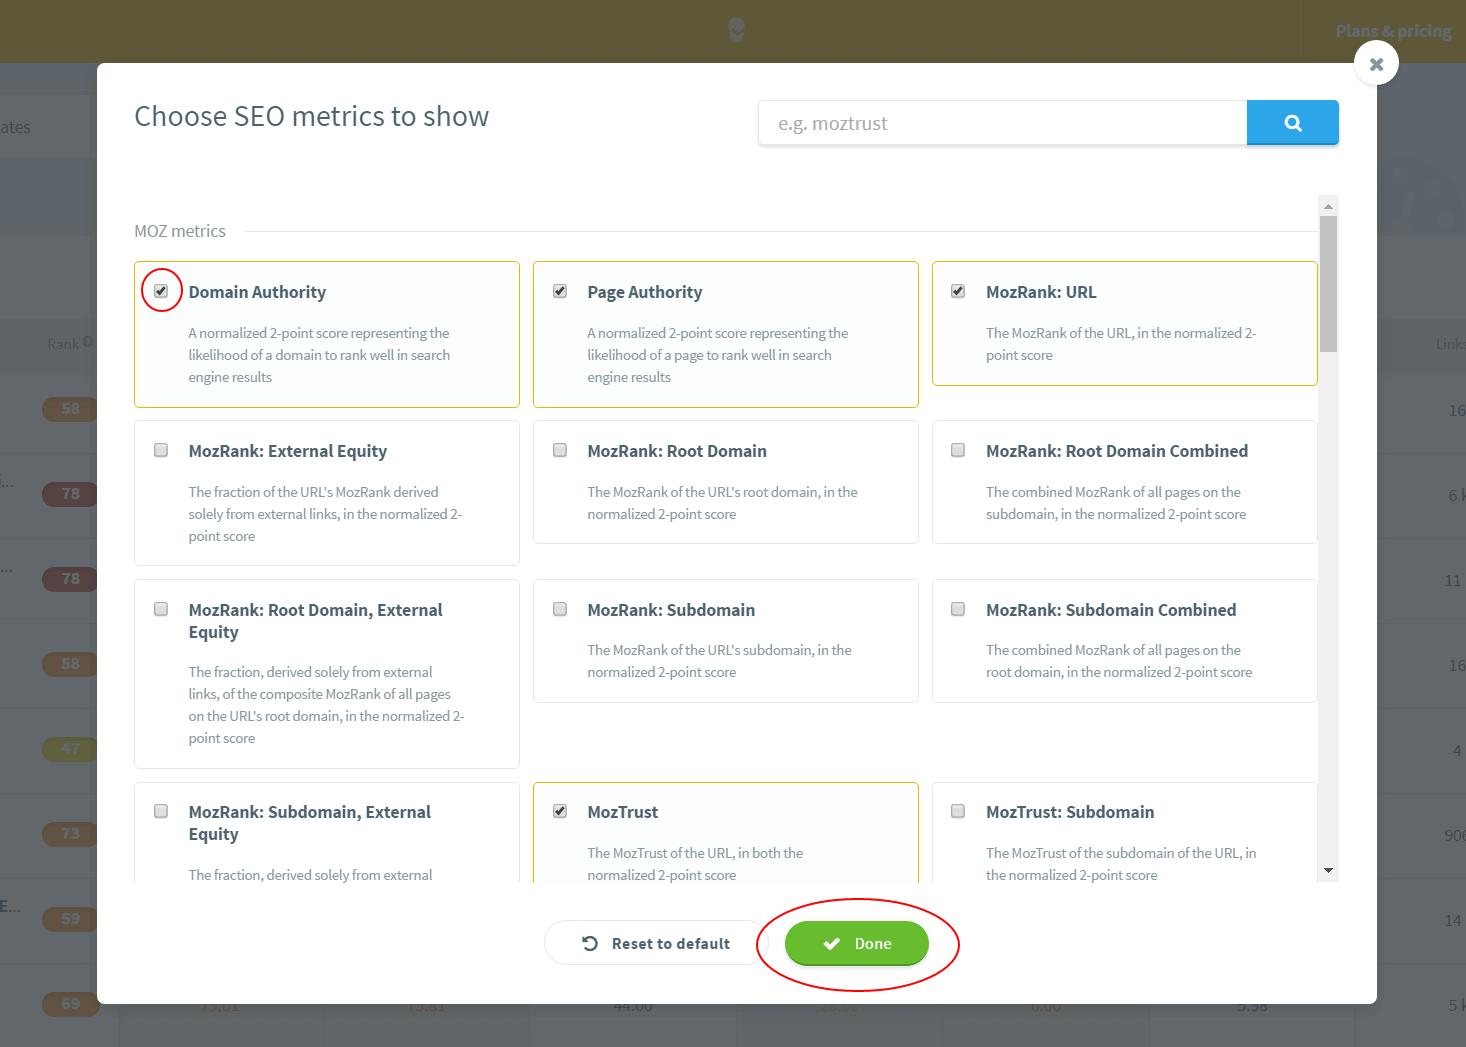 serpchecker guide manage metrics